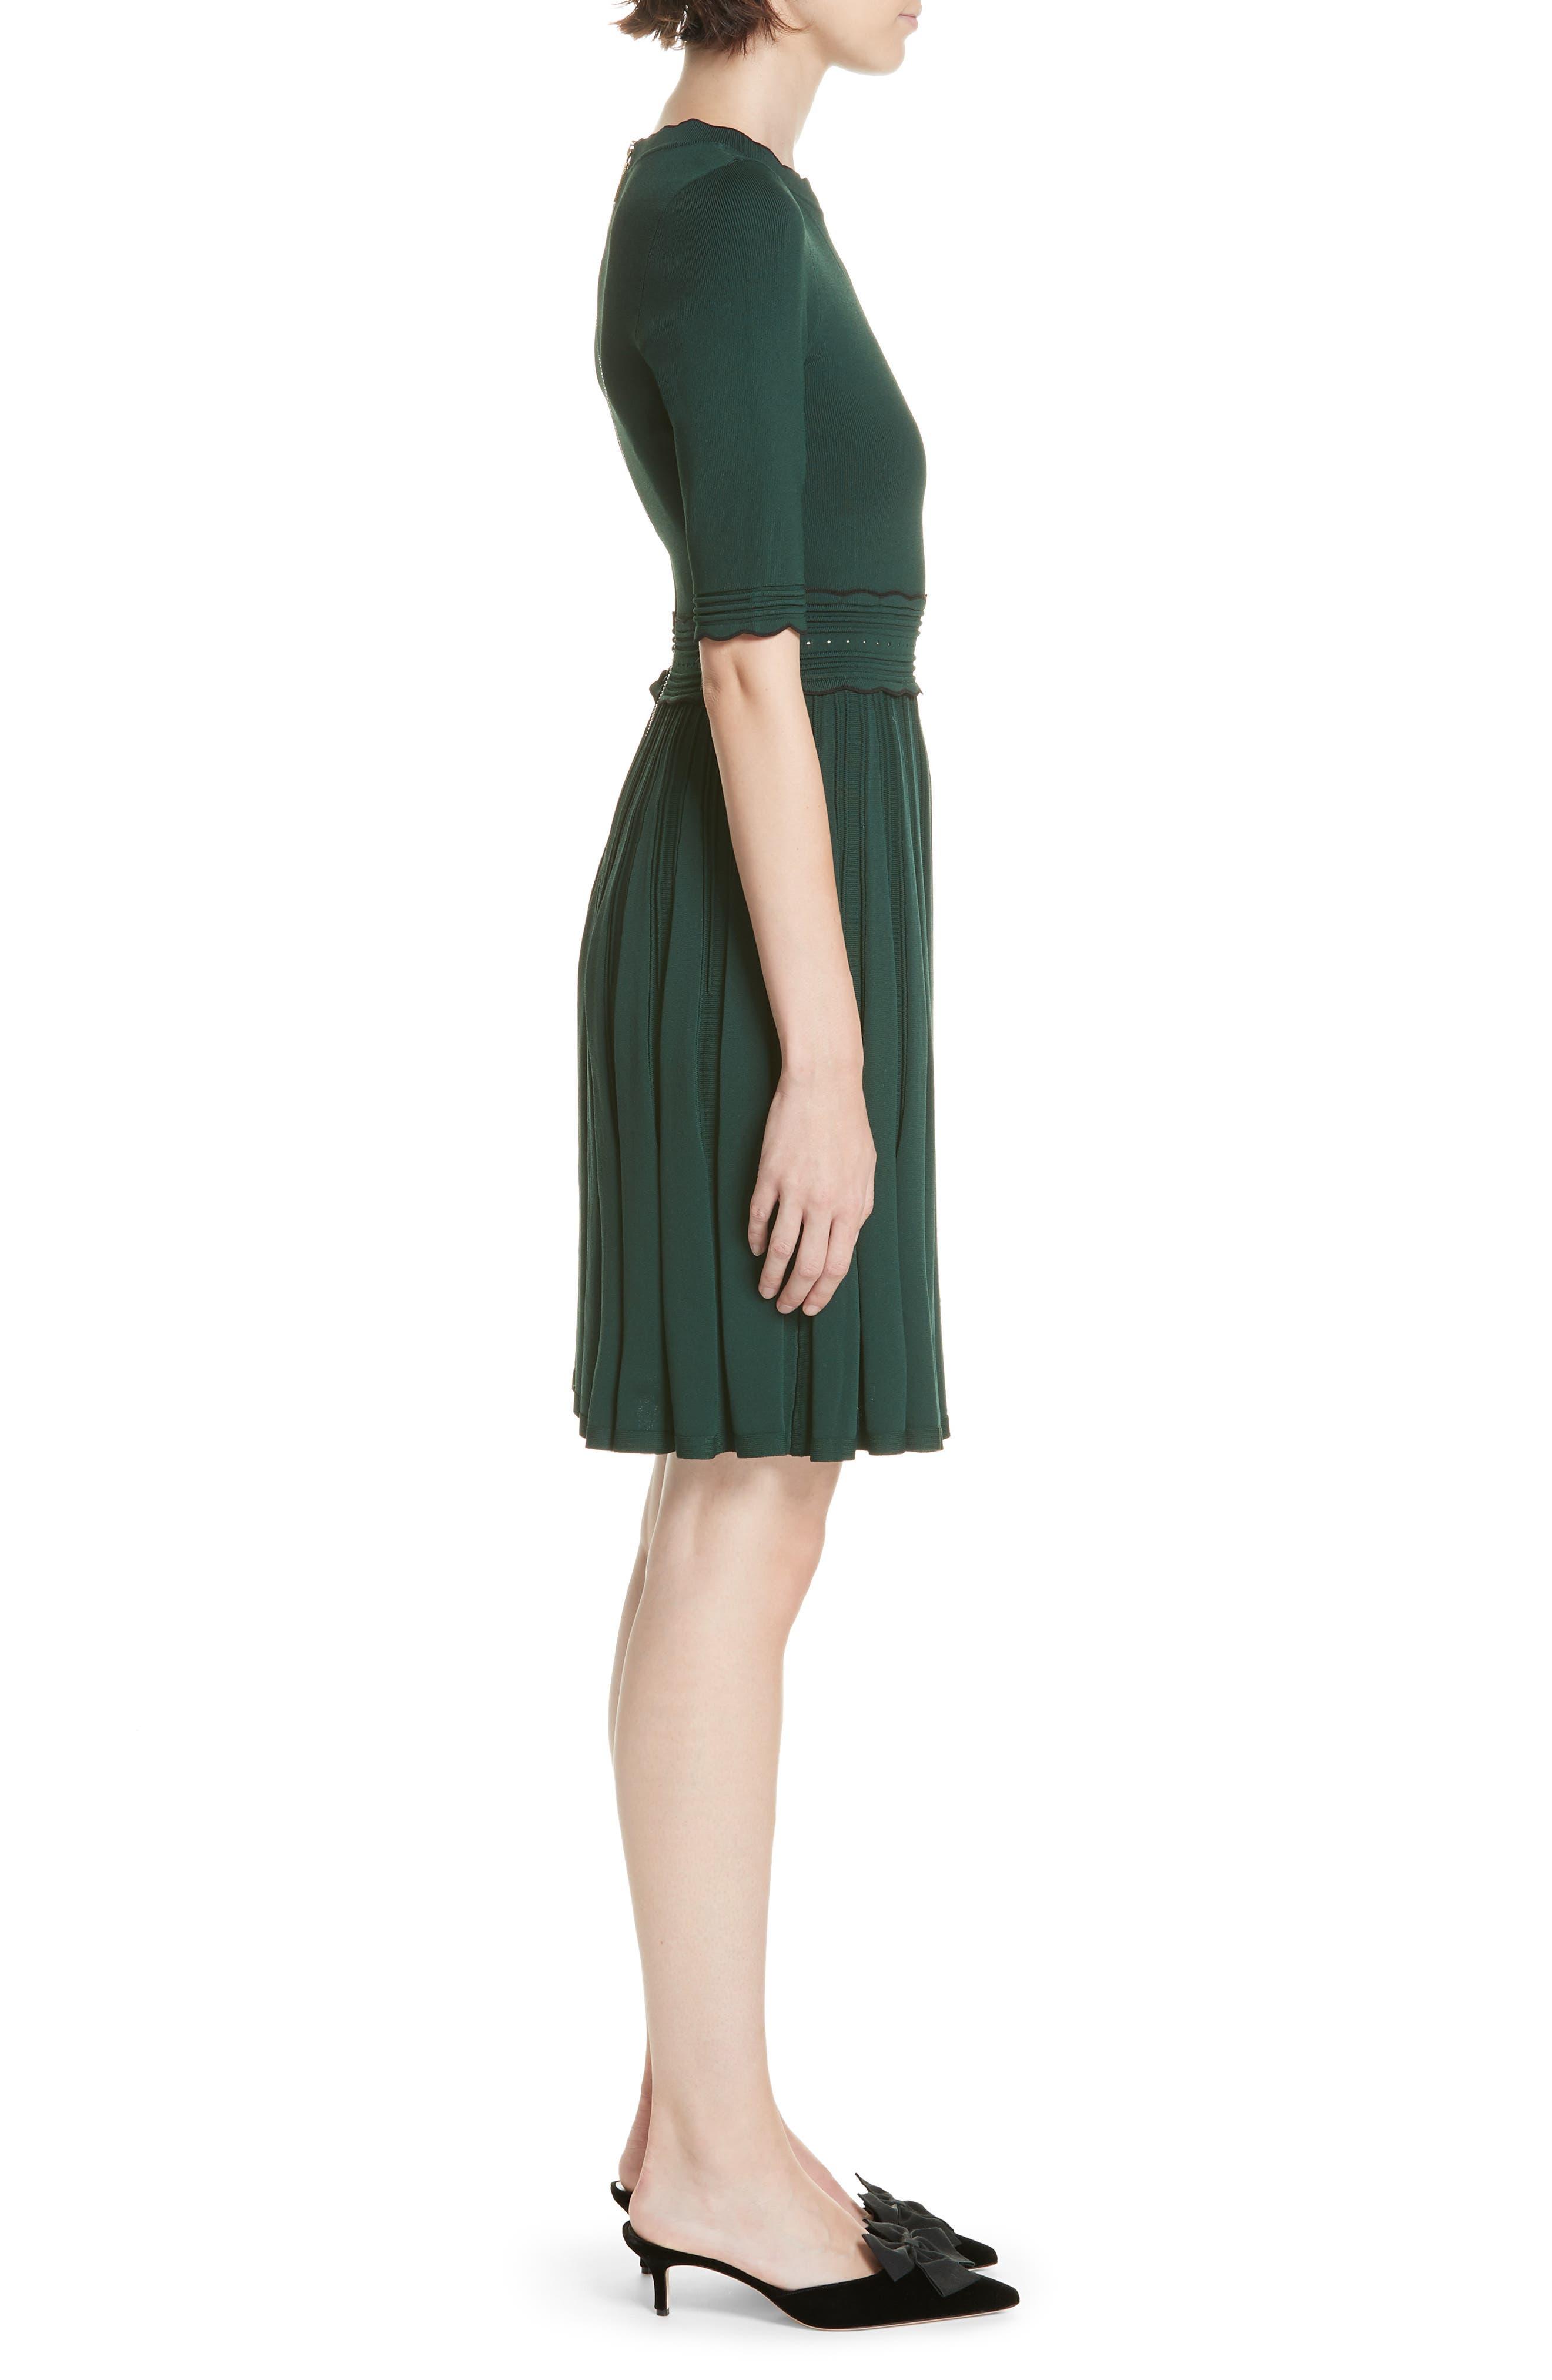 Dorlean Knit Dress,                             Alternate thumbnail 3, color,                             DARK GREEN